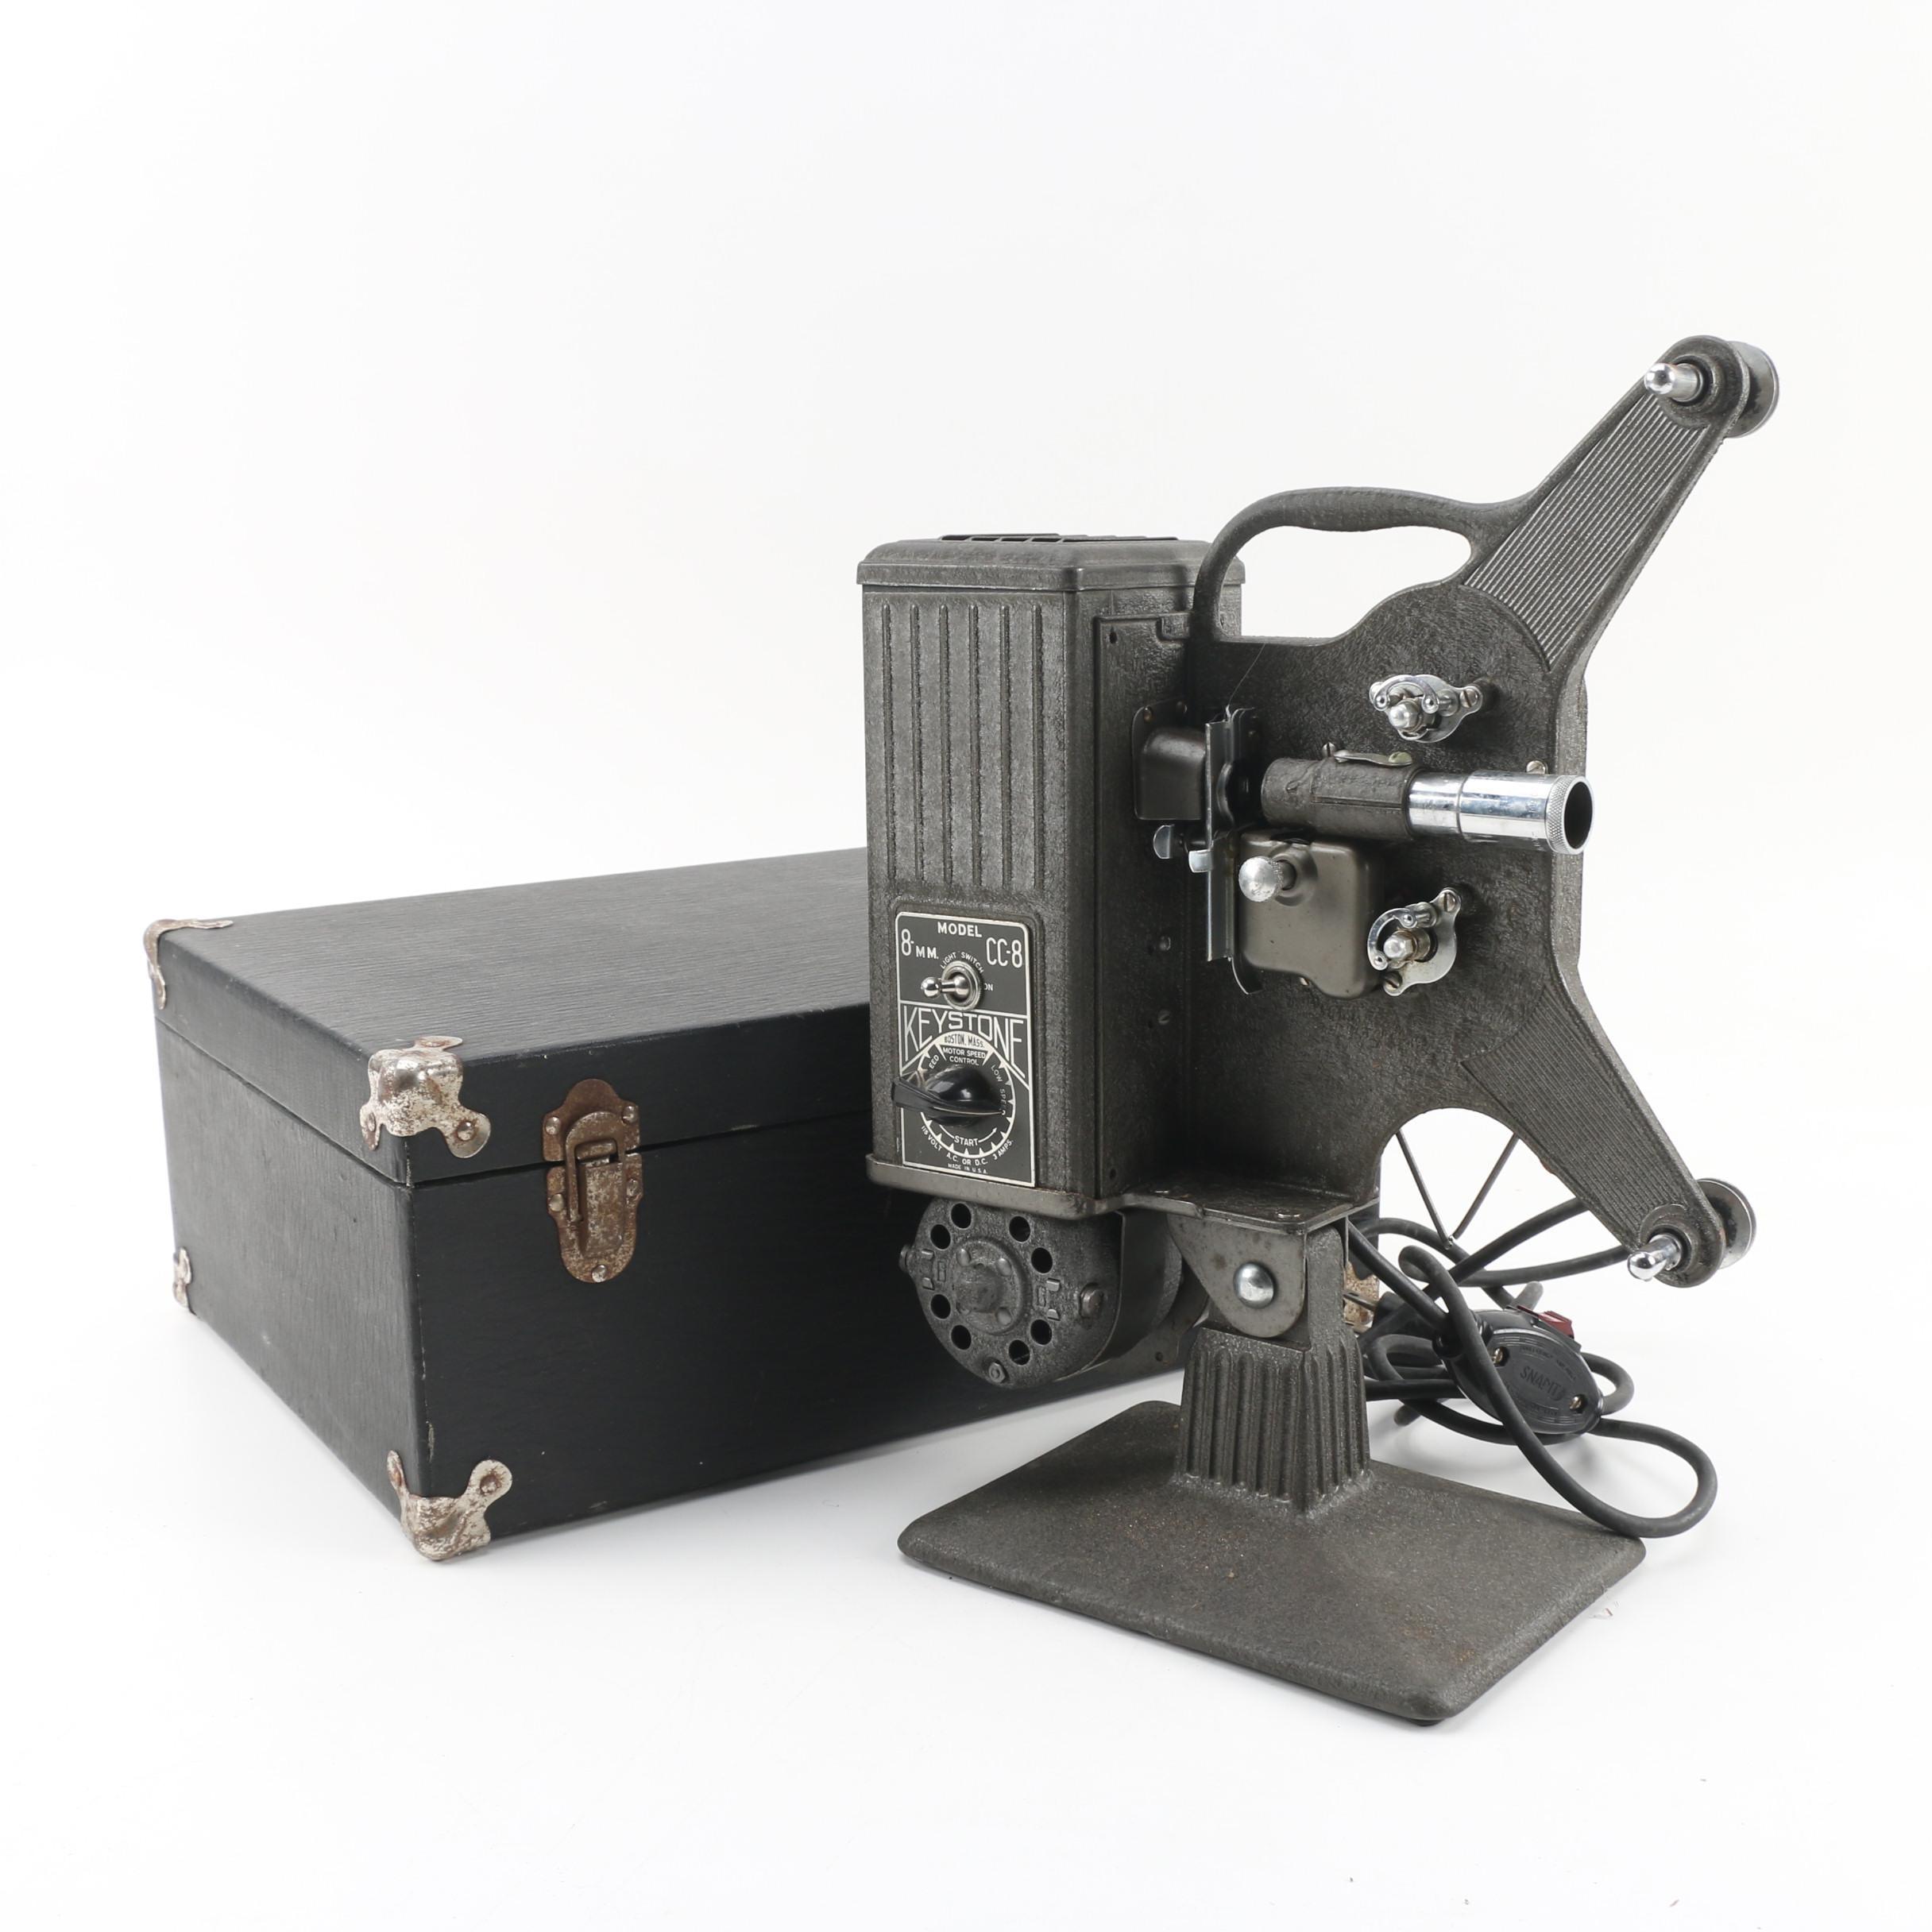 Keystone CC-8 Portable 8mm Film Projector, Circa 1940s